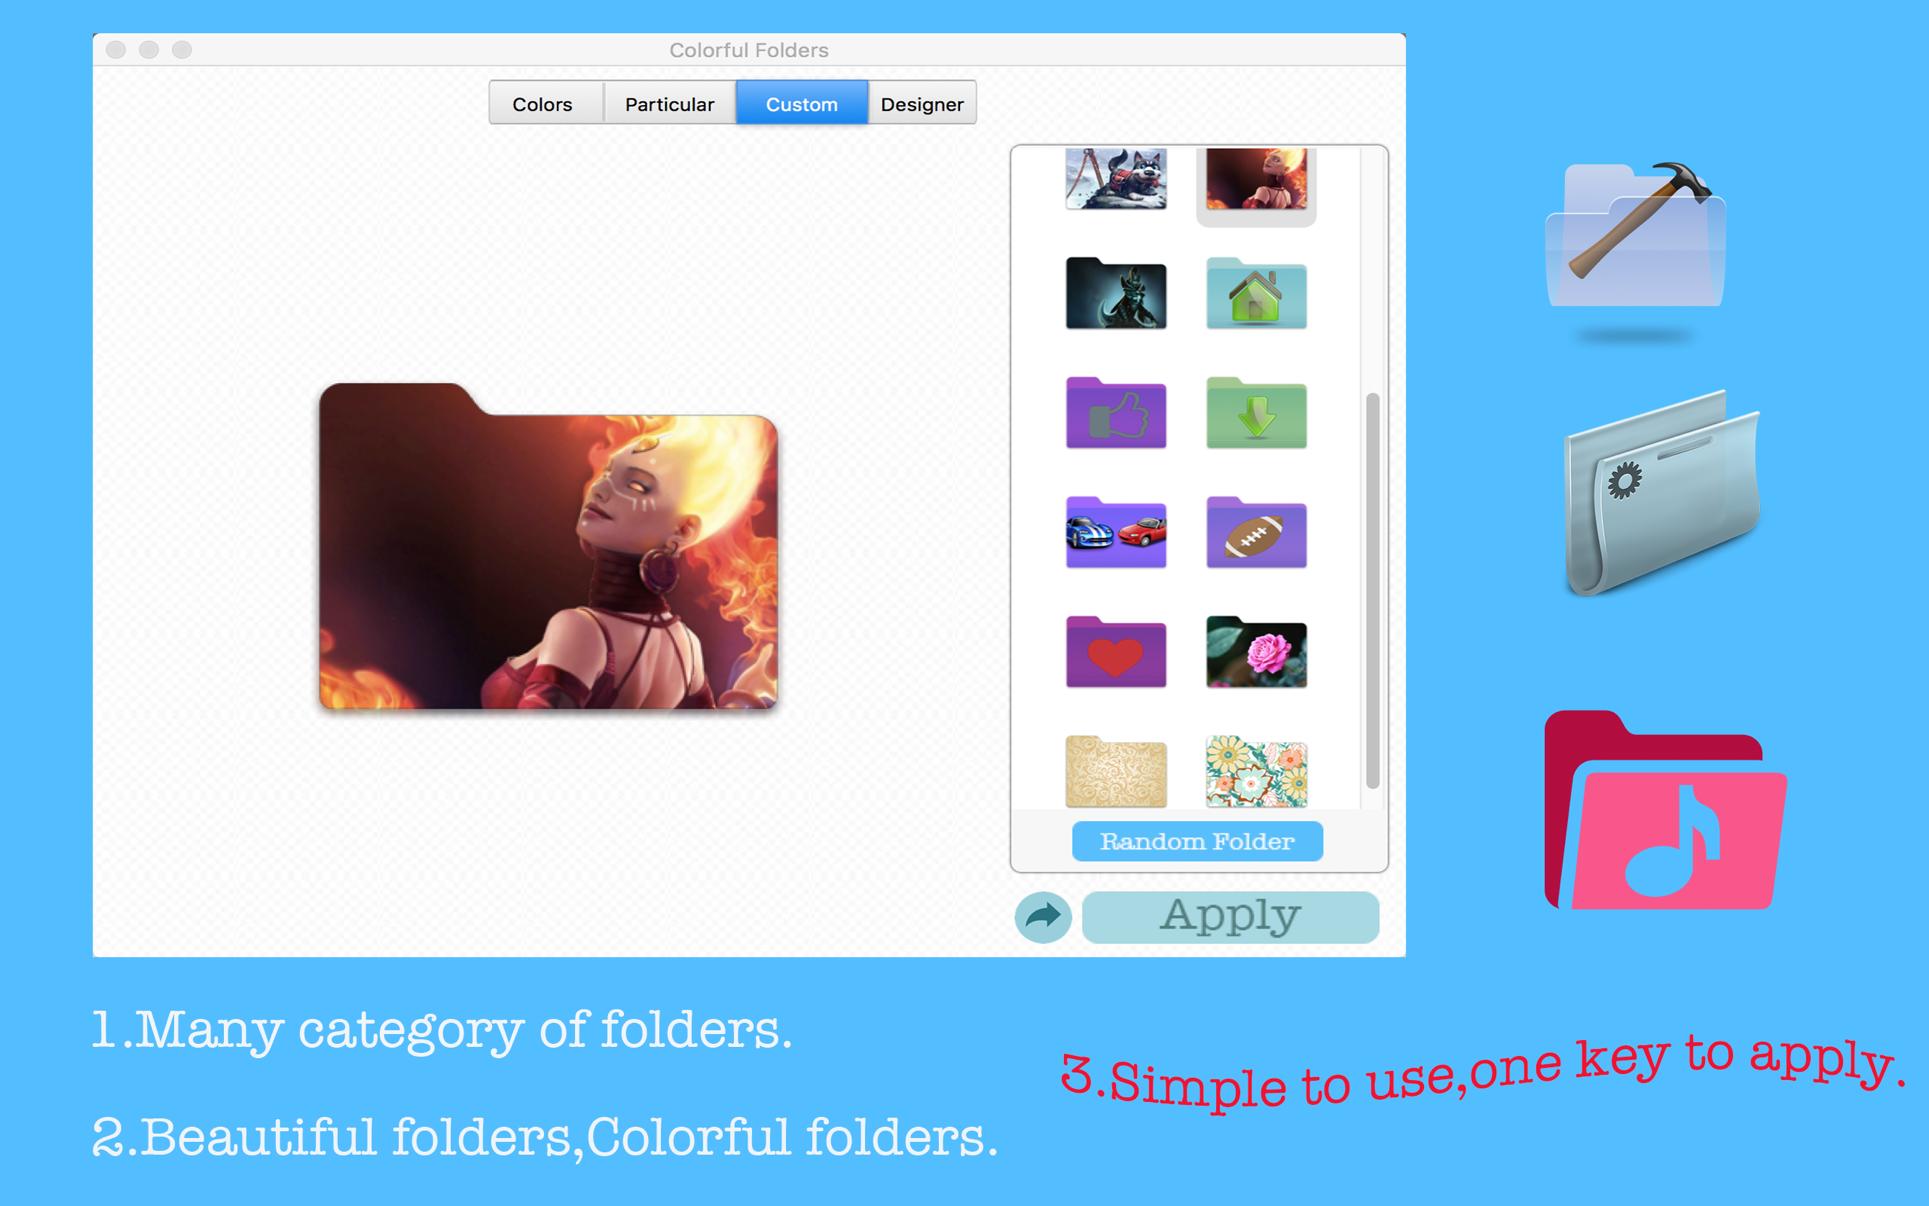 Colorful Folders Mac 破解版 星语多彩文件夹